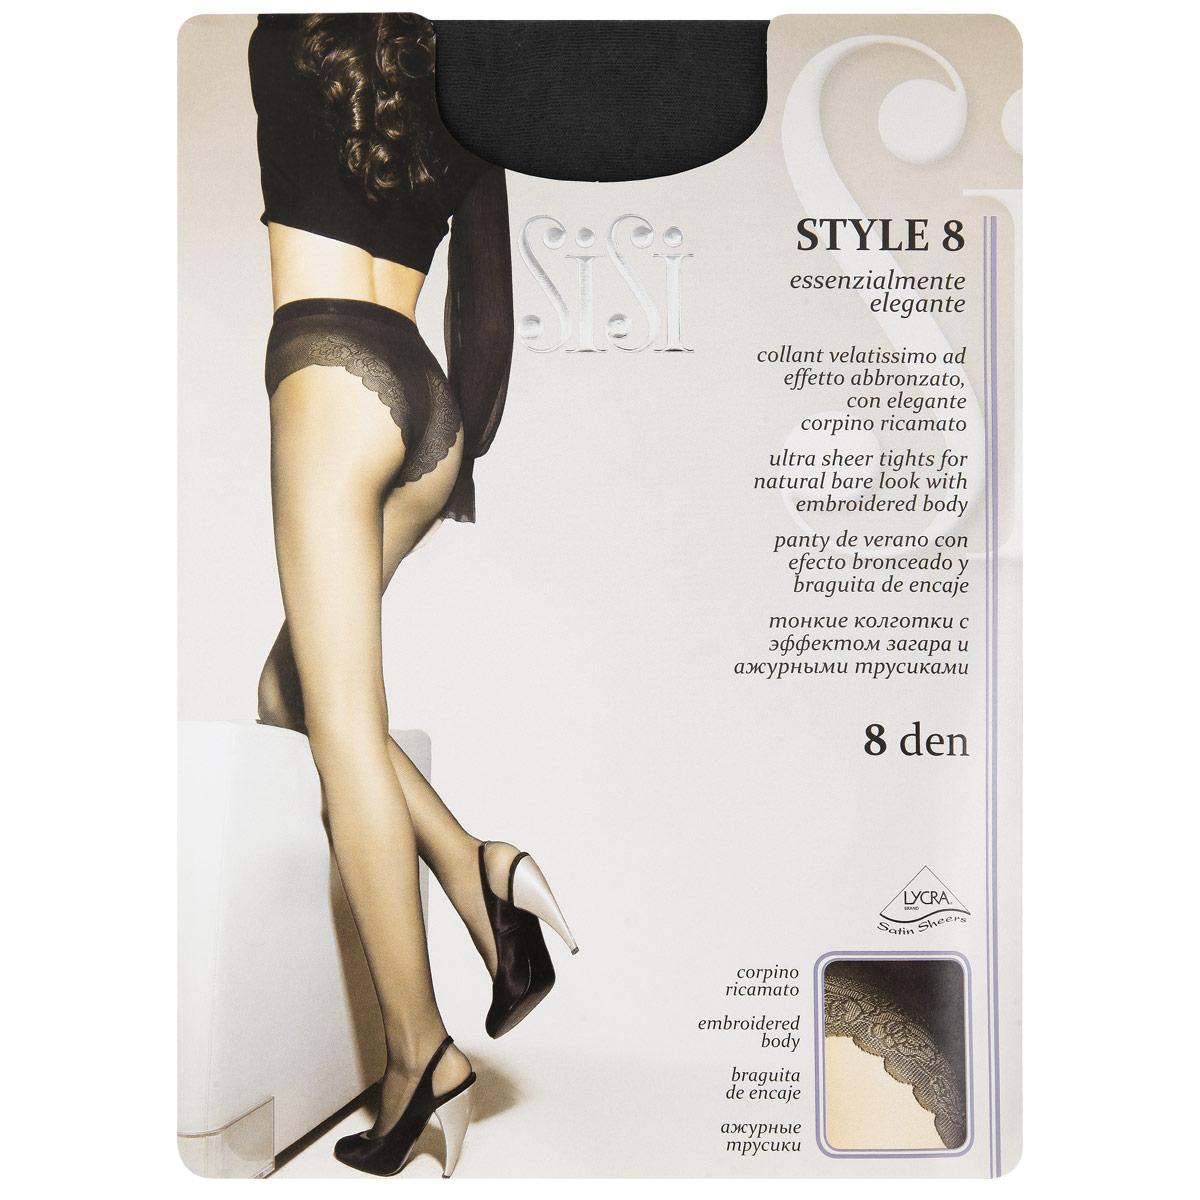 Колготки женские Sisi Style 8, цвет: Nero (черный). 142. Размер 3 (M) колготки sisi style размер 2 плотность 15 den nero